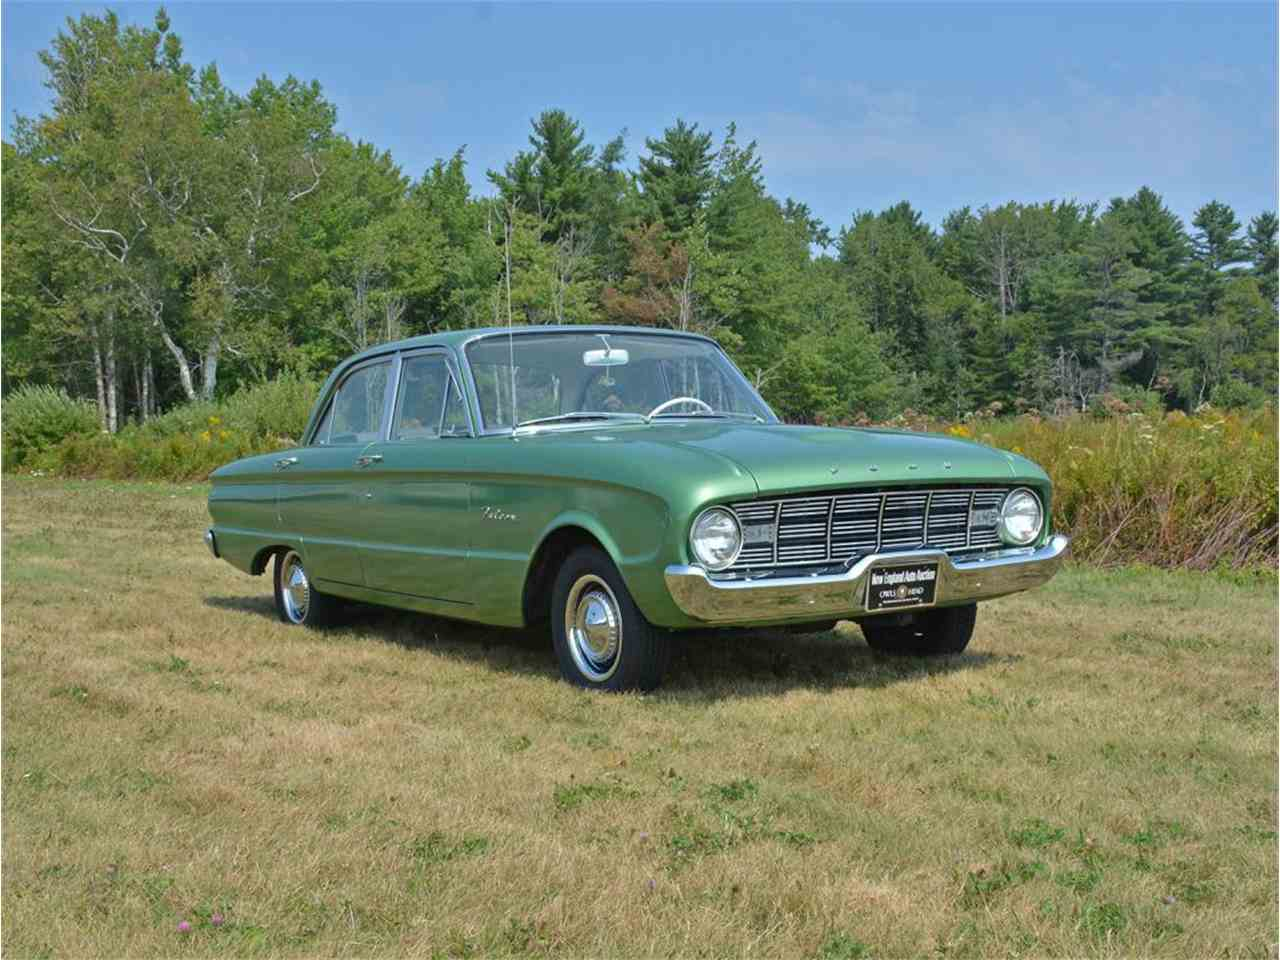 1960 Ford Falcon for Sale | ClassicCars.com | CC-885356